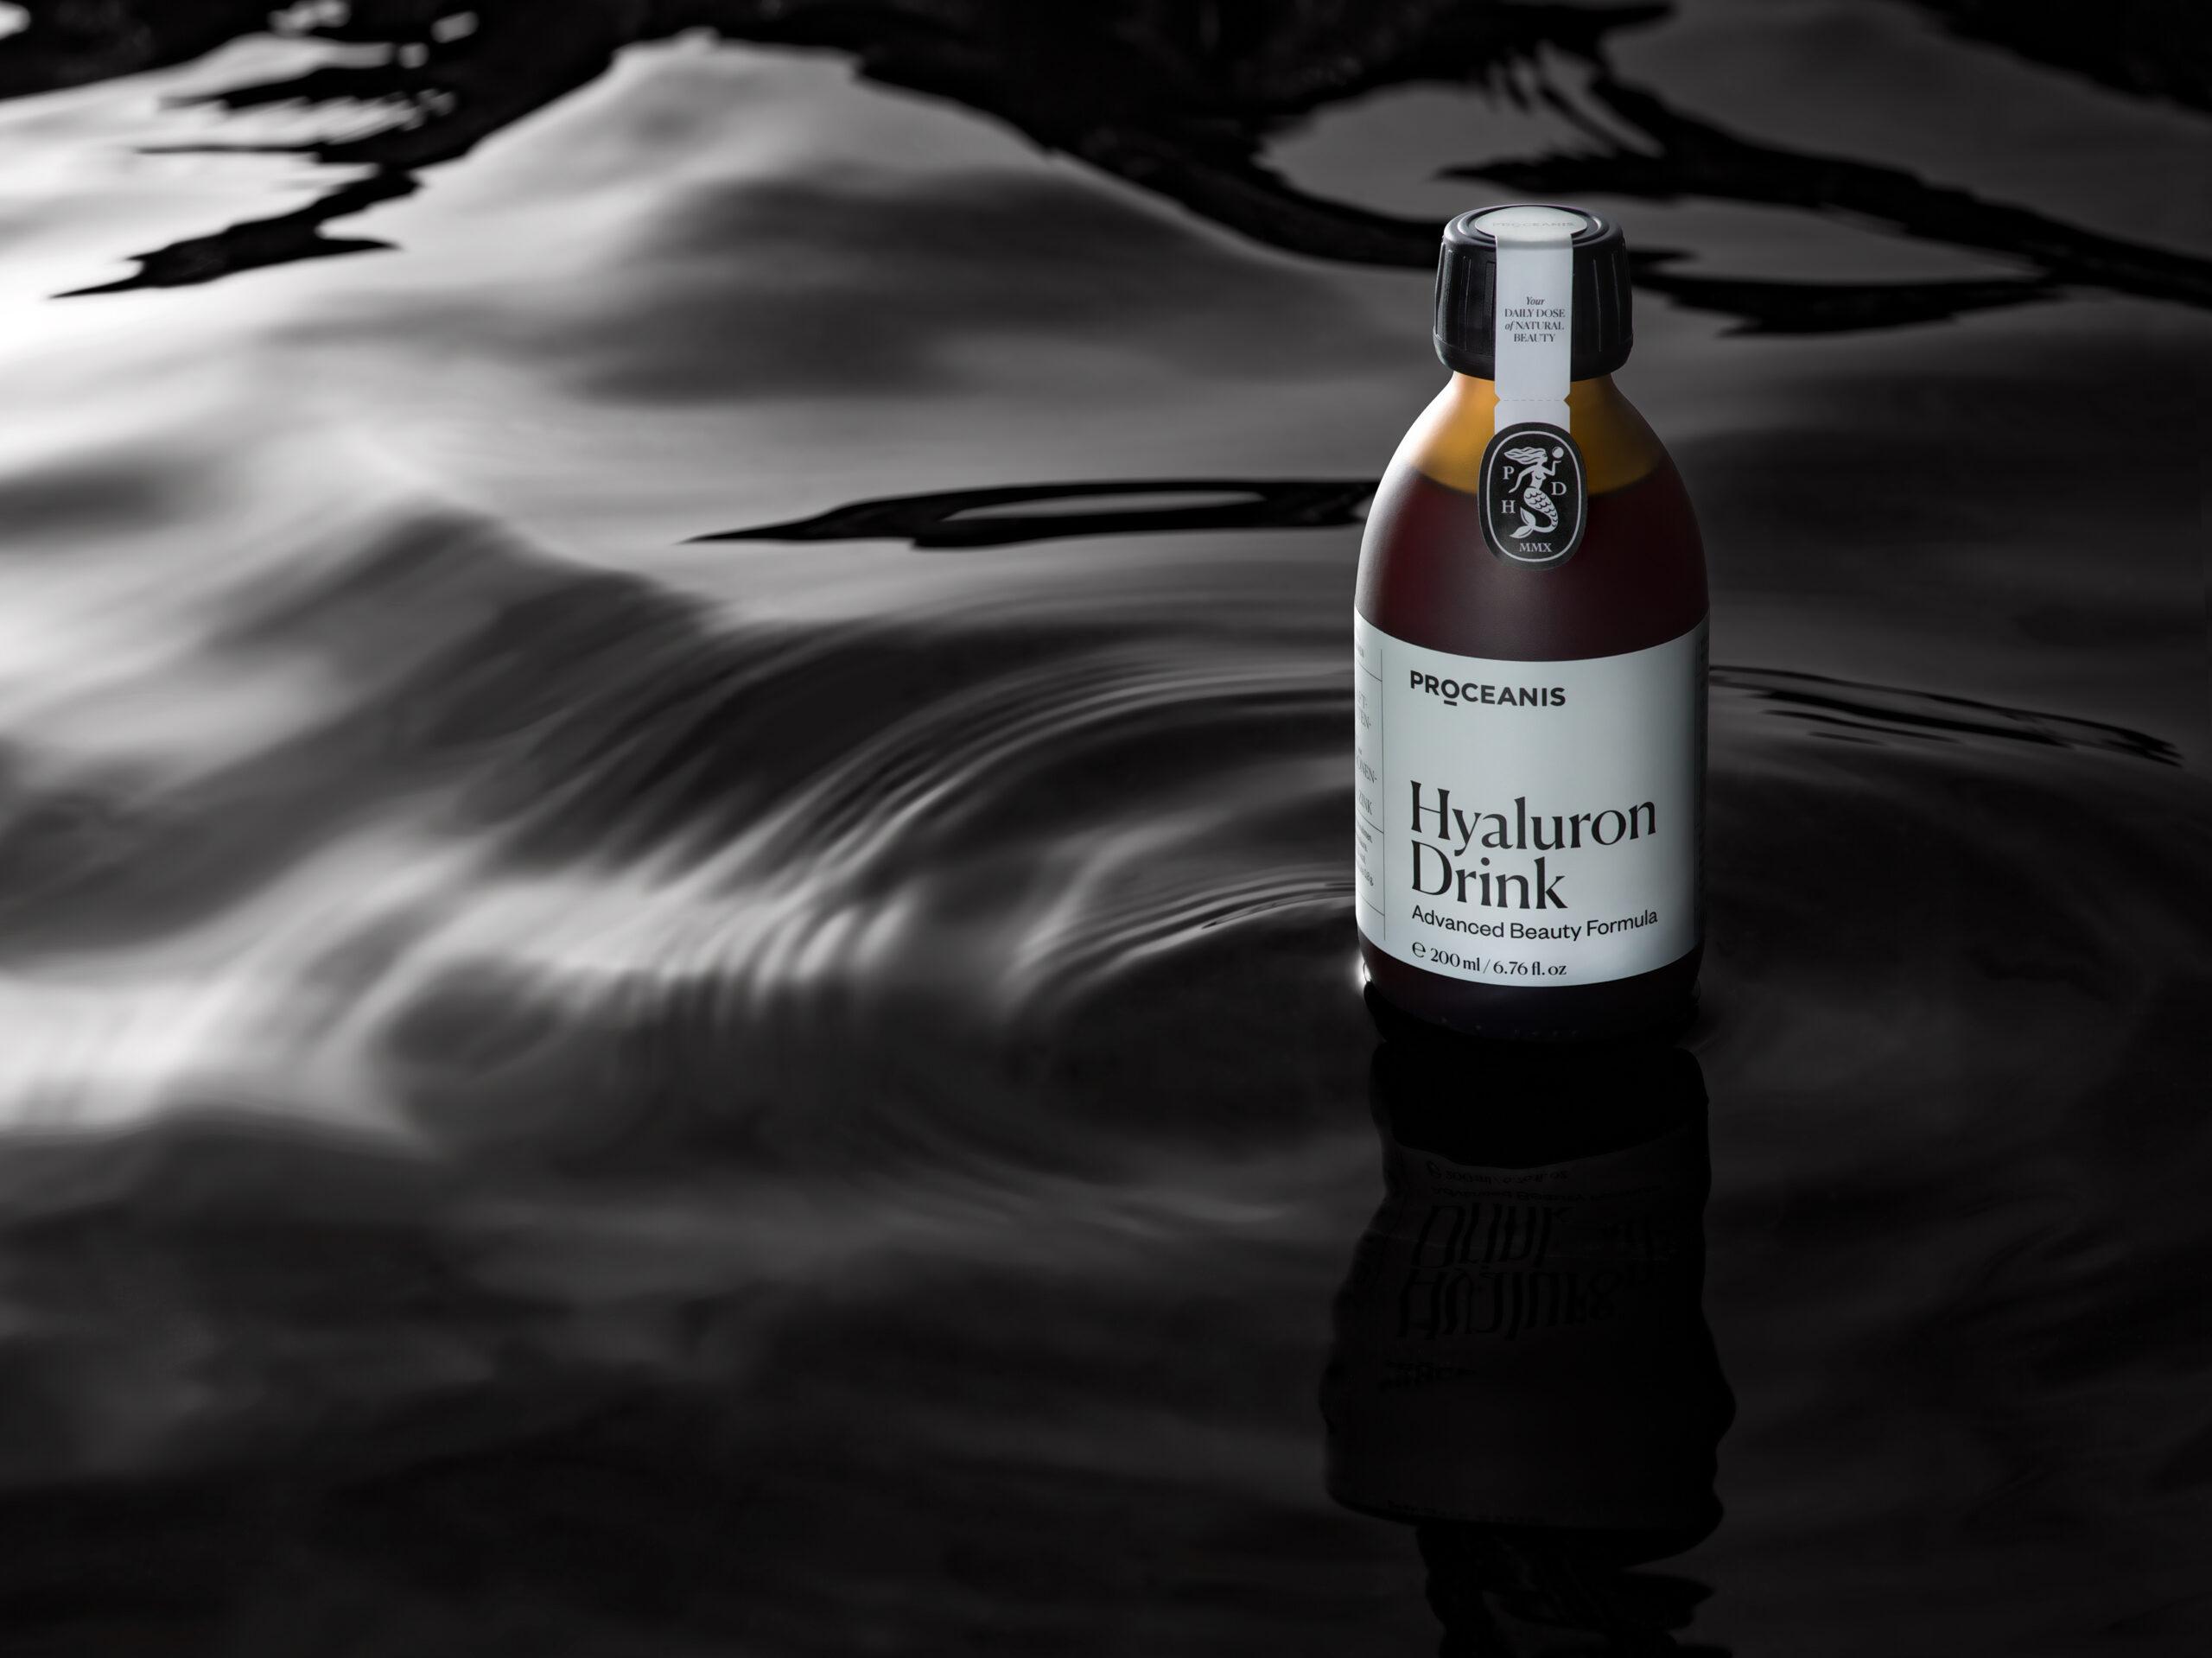 Proceanis-Hyaluron-Drink